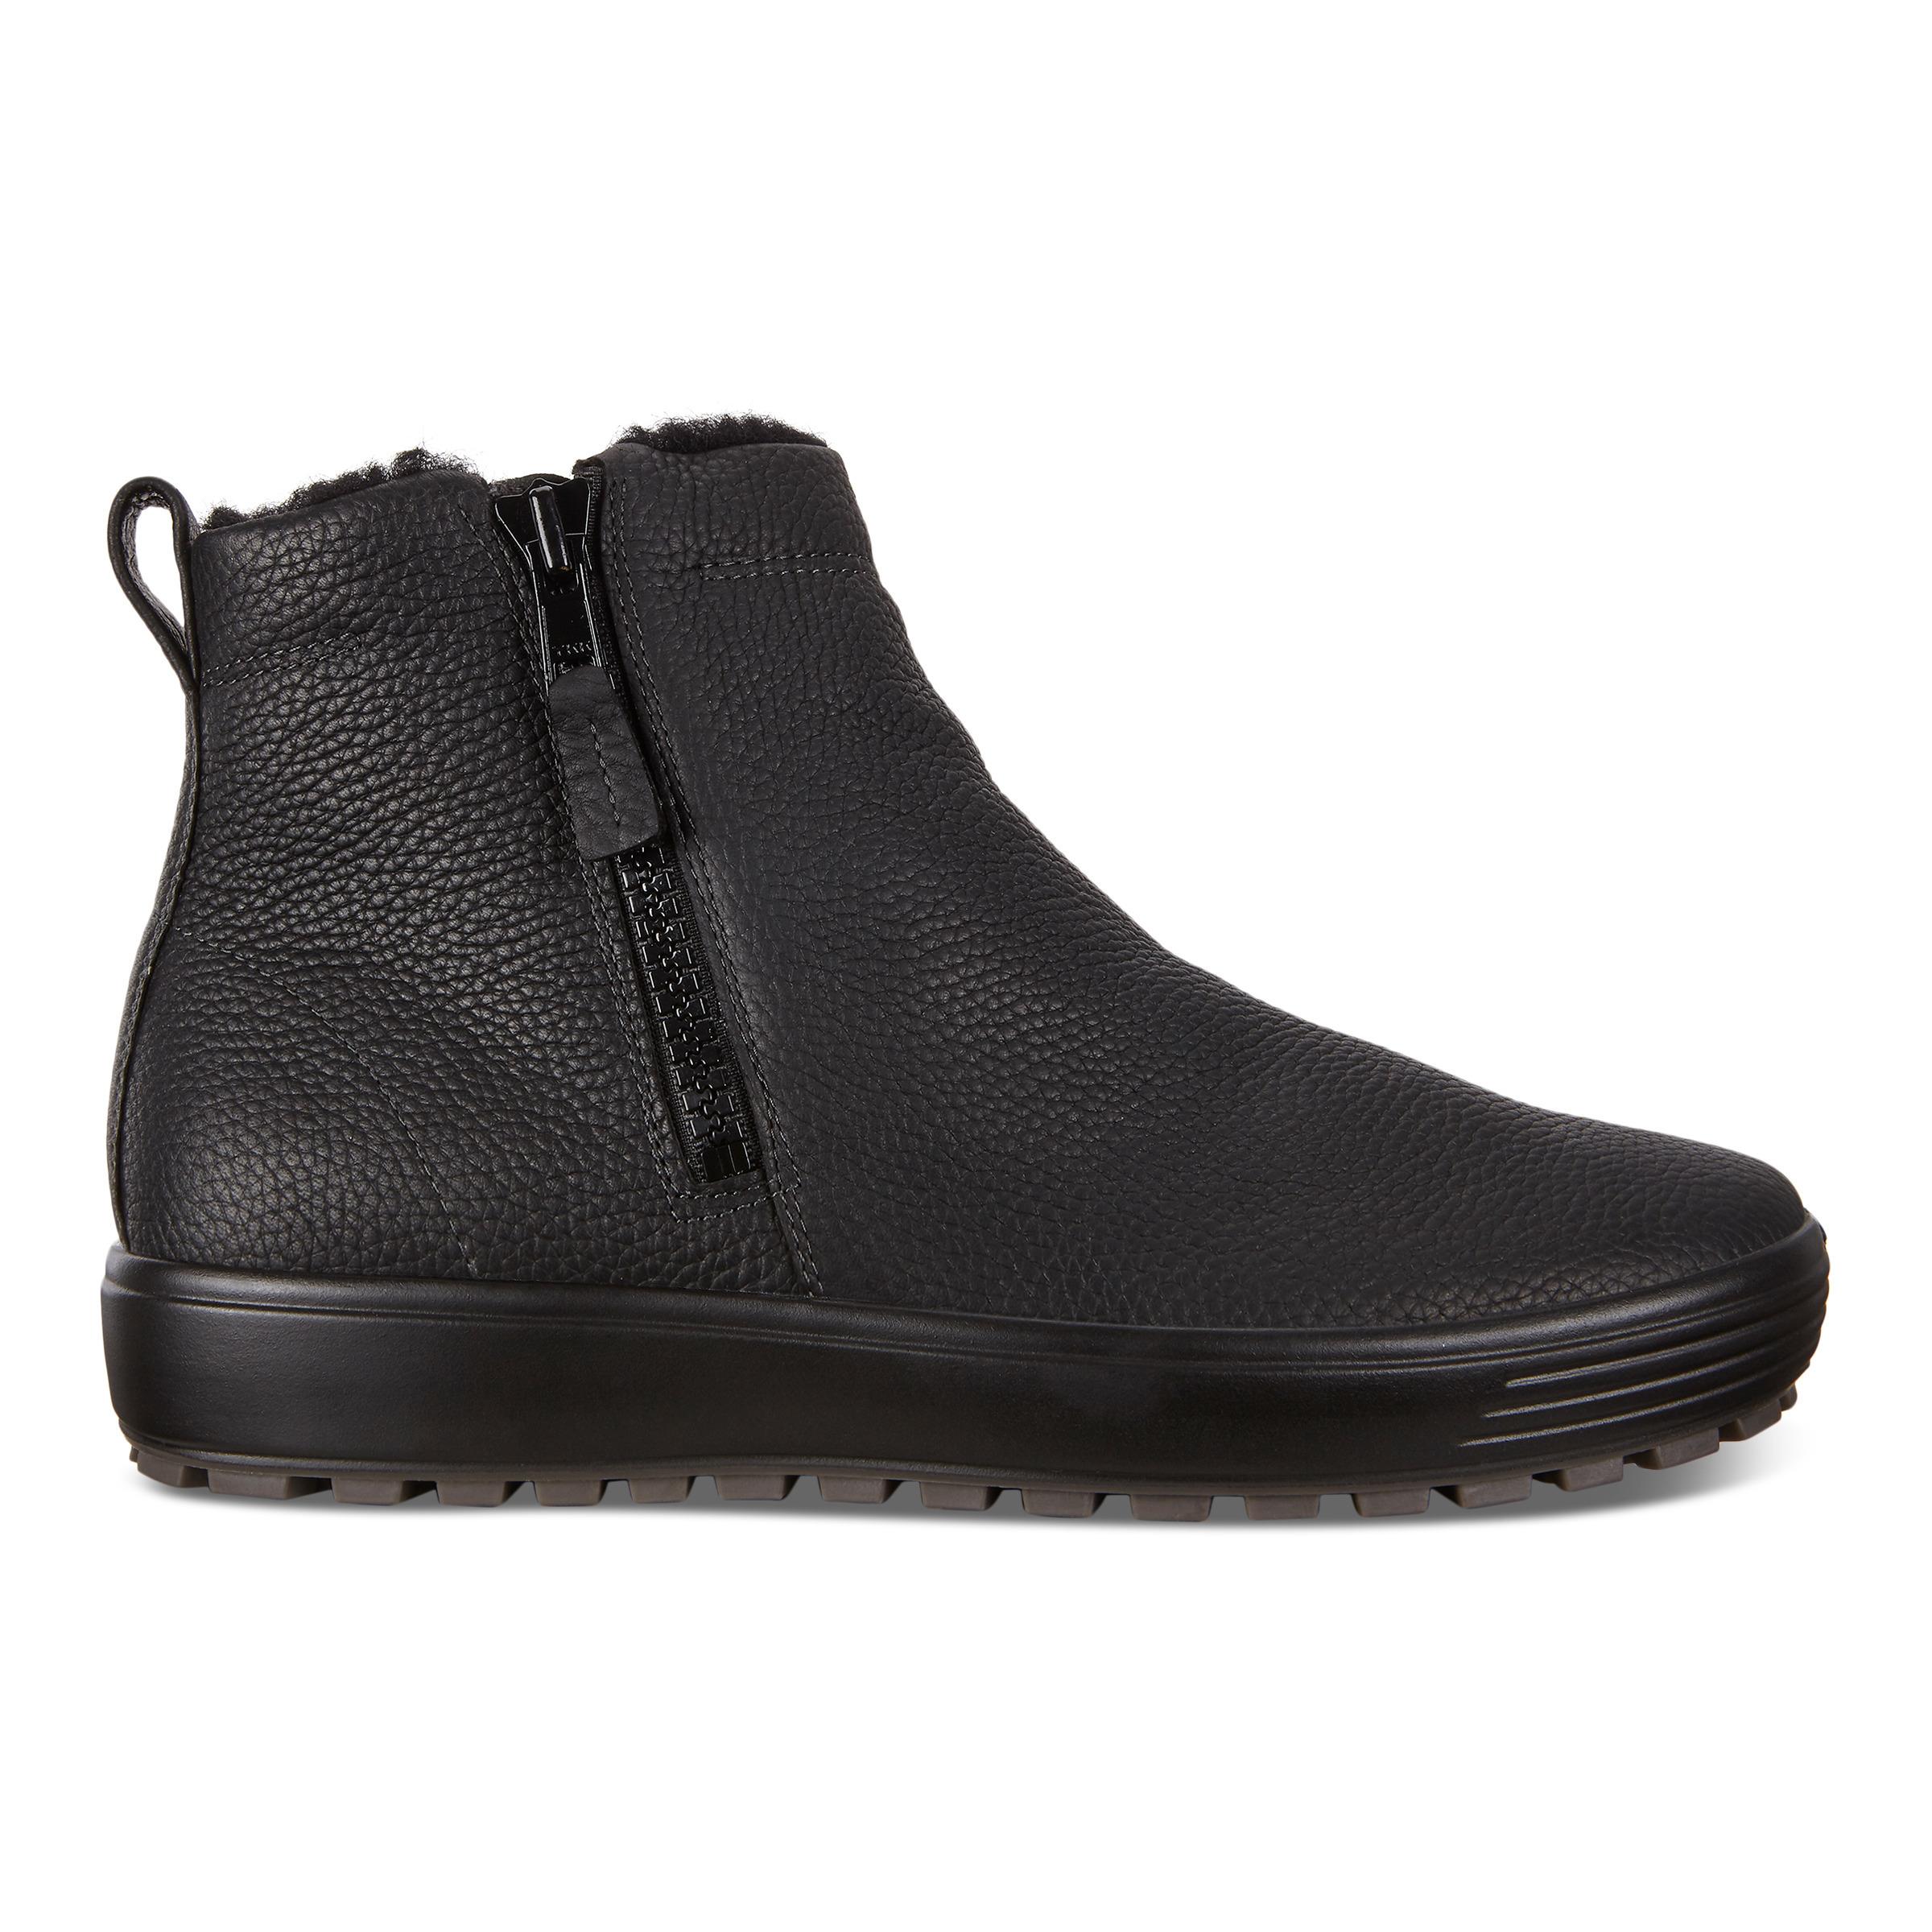 Ecco Chukka Boots Canada | Ecco Turn Gtx Mens Black